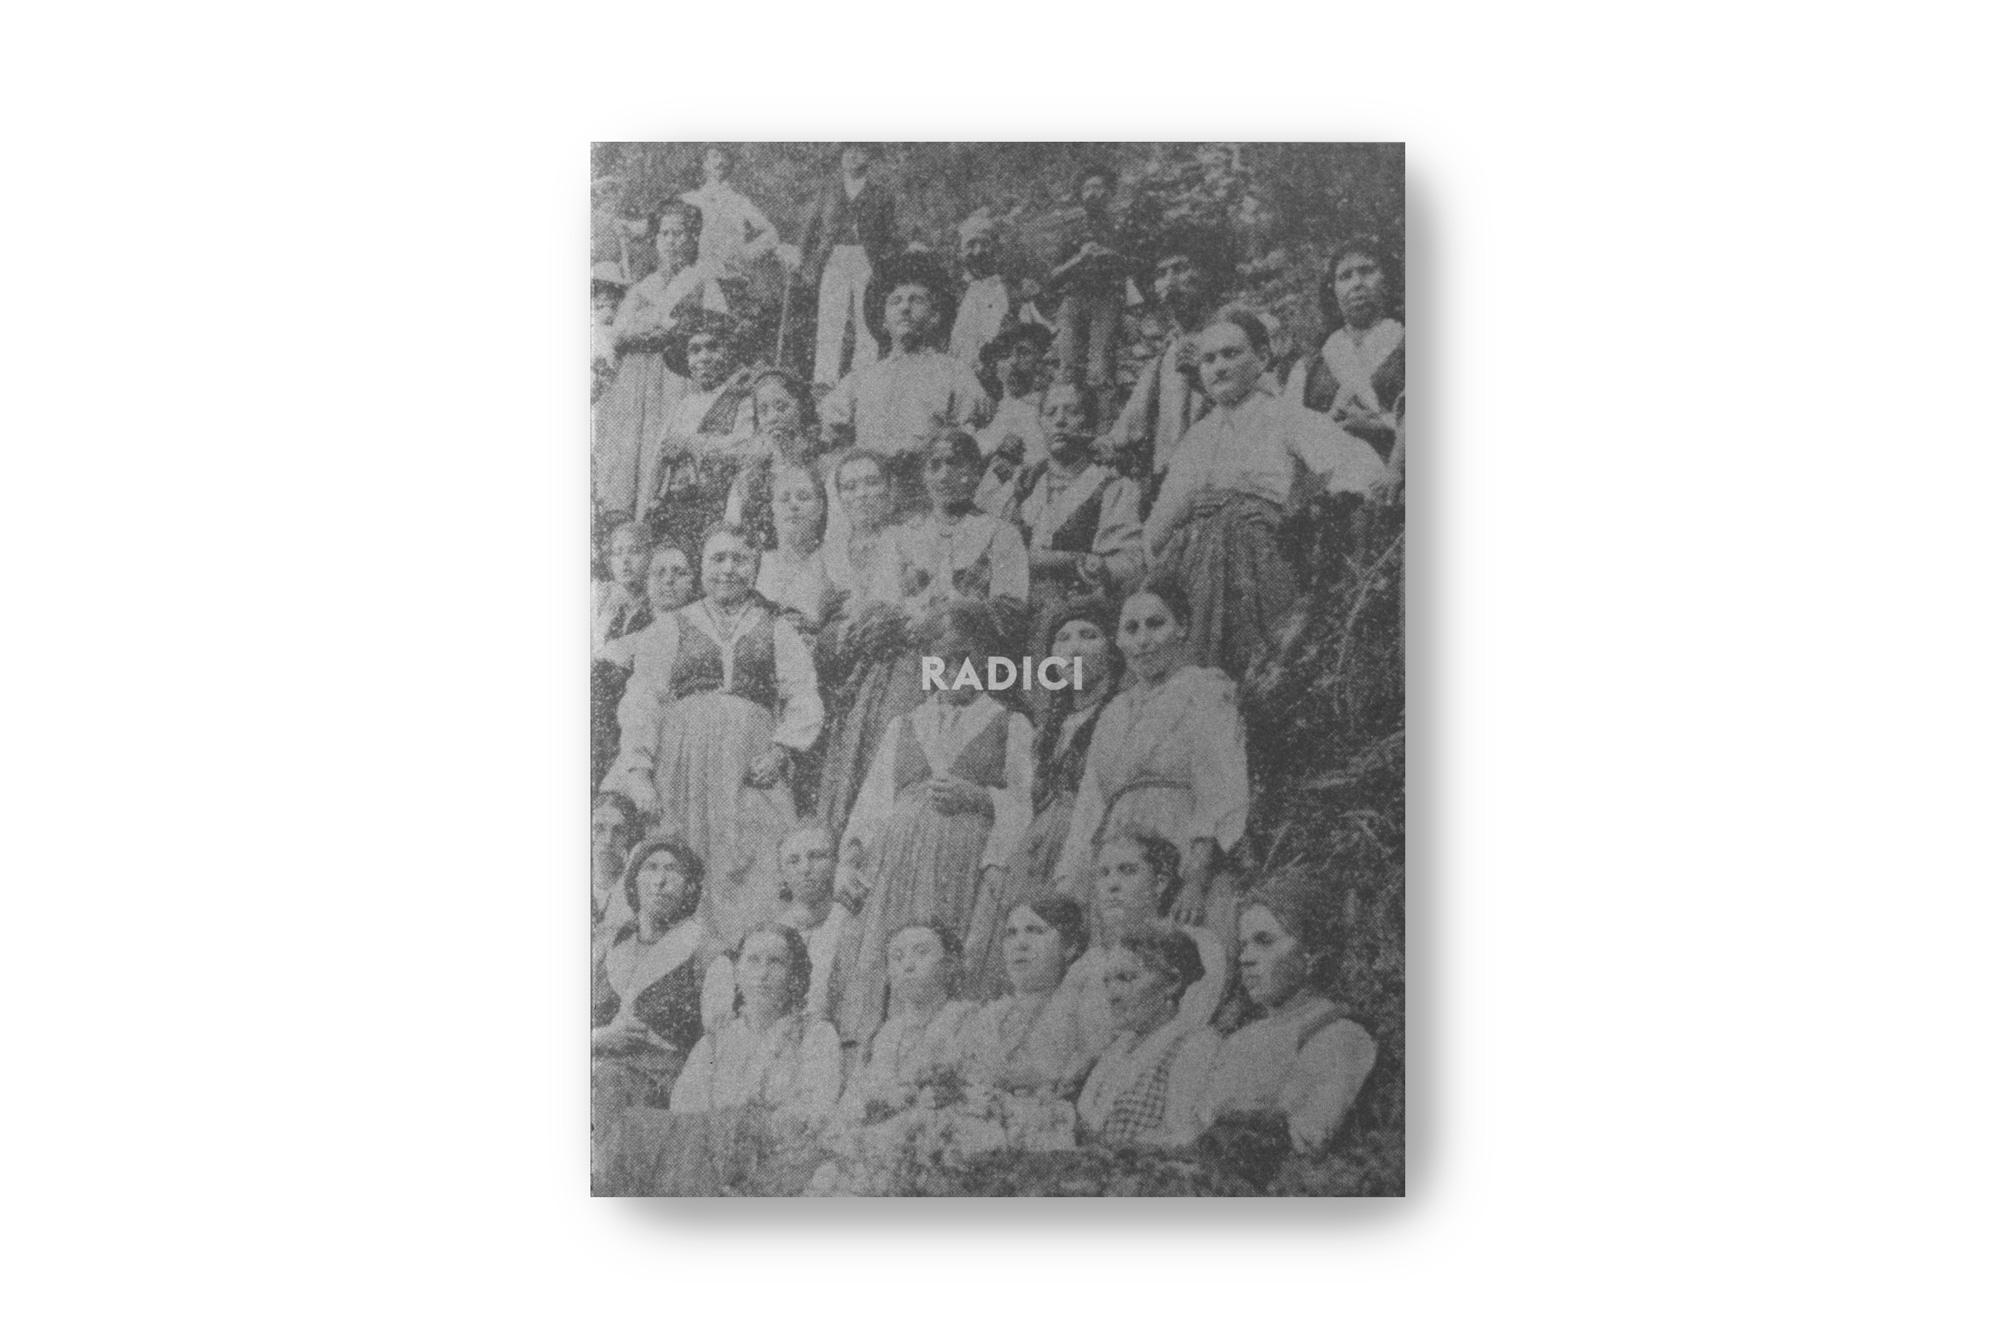 fabrizioalbertini_radici_unveild_01.jpg